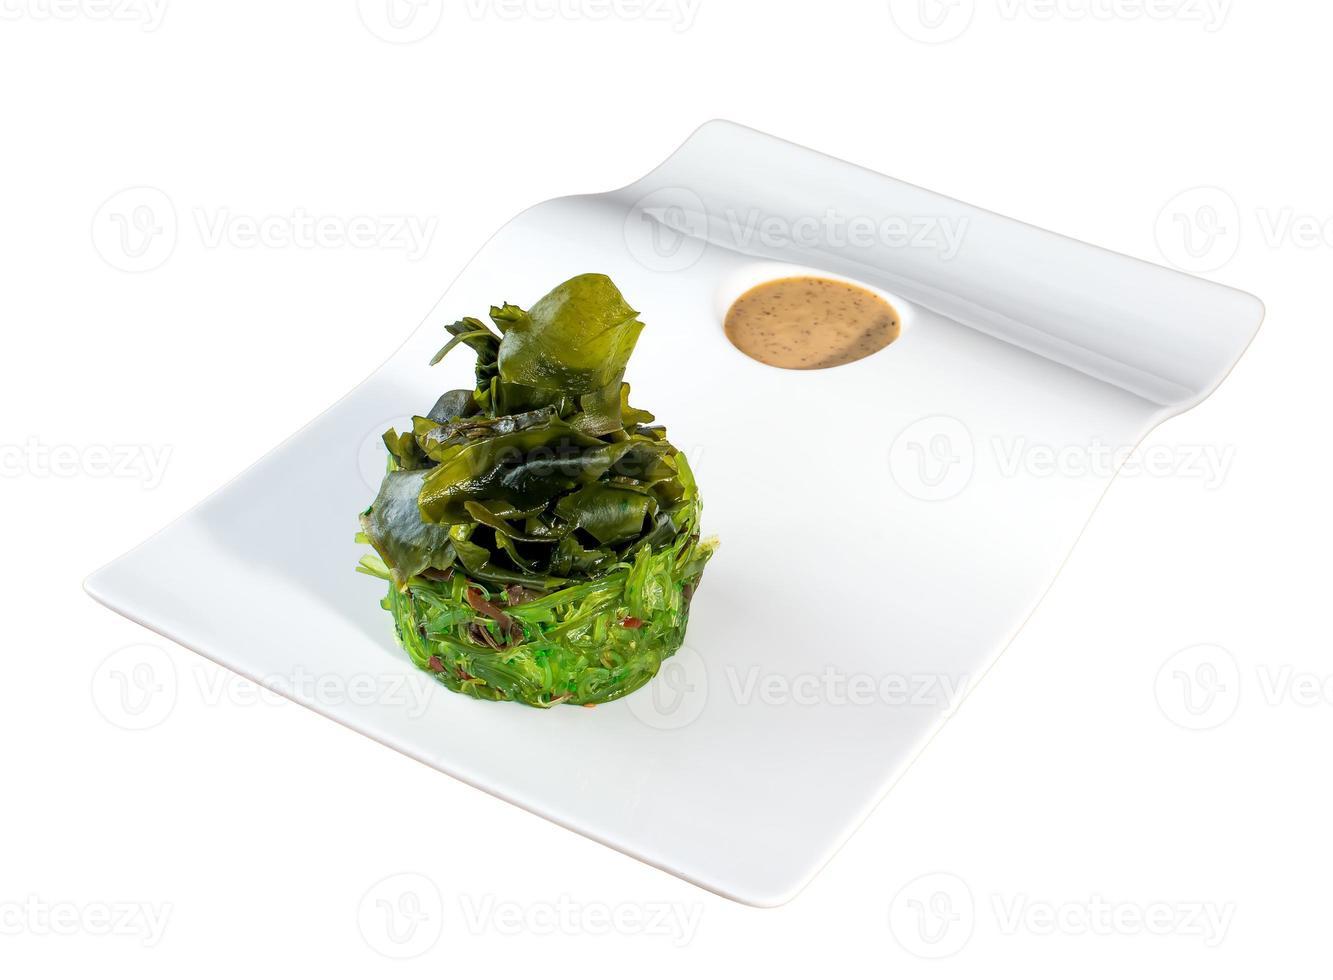 salade d'algues photo